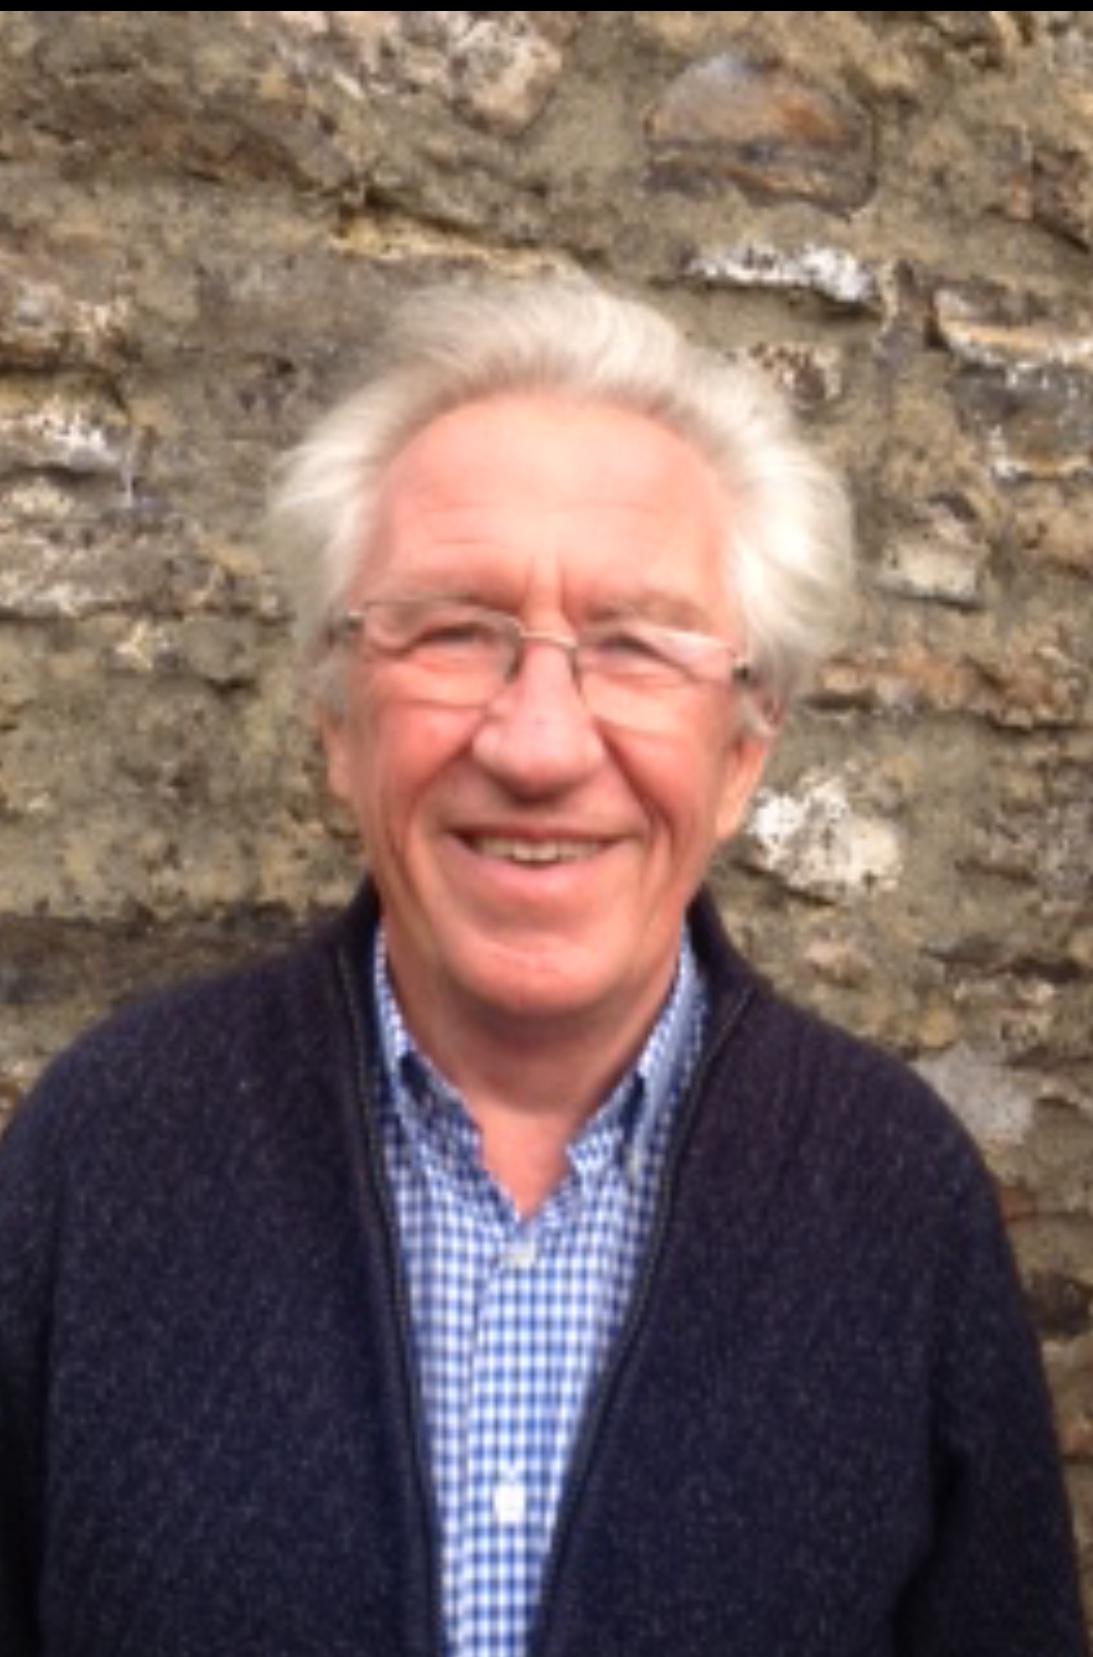 David Clitheroe